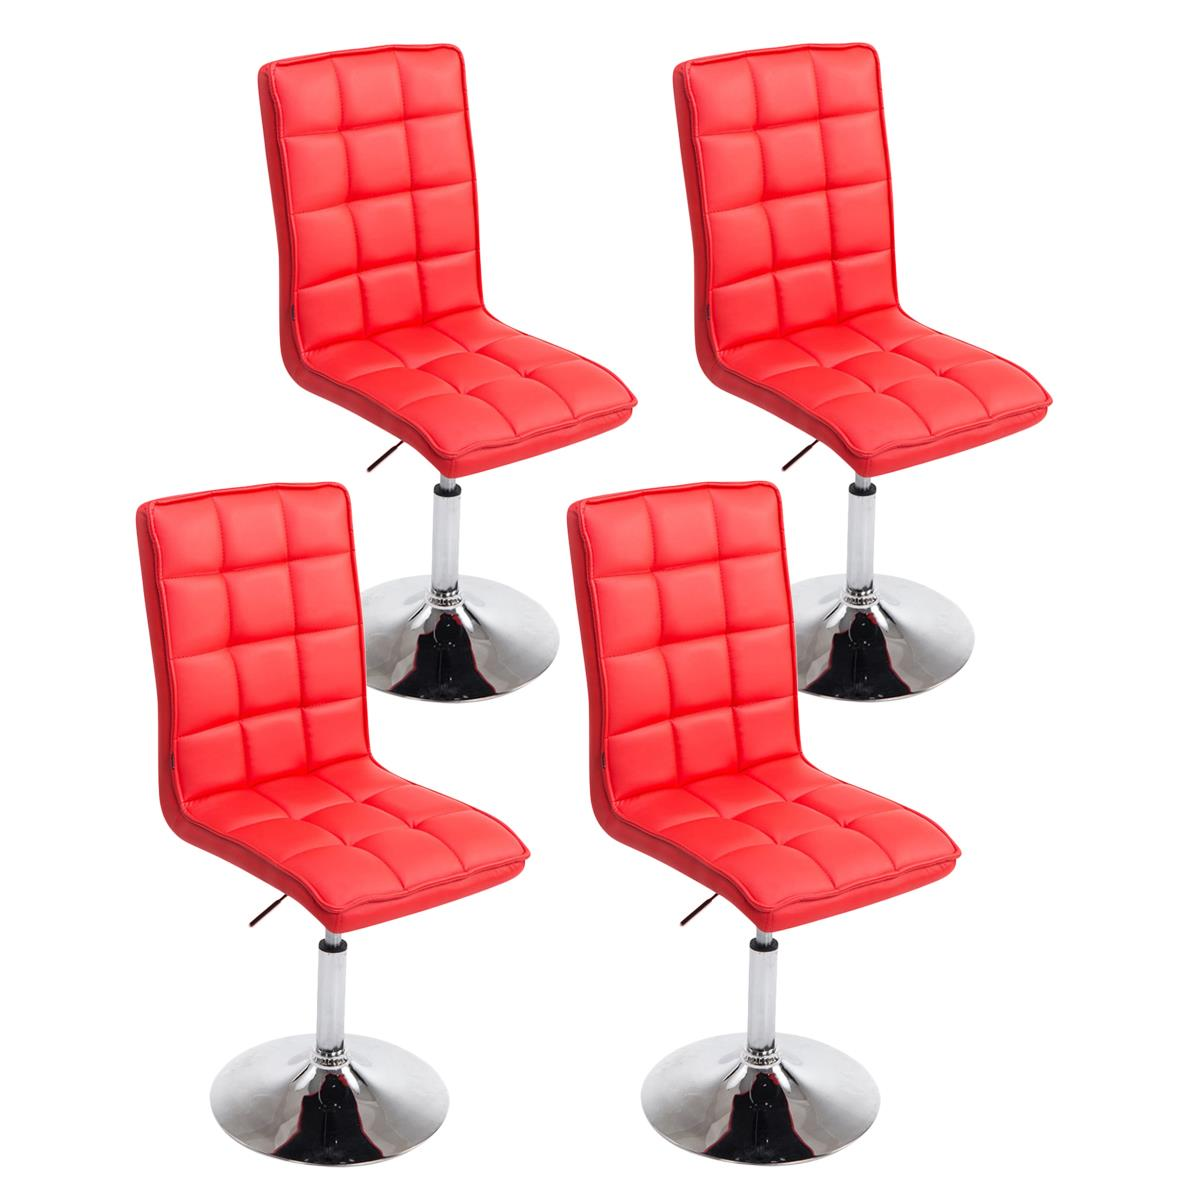 Conjunto de 4 sillas de comedor o cocina osuna piel en for Sillas de comedor tapizadas en piel